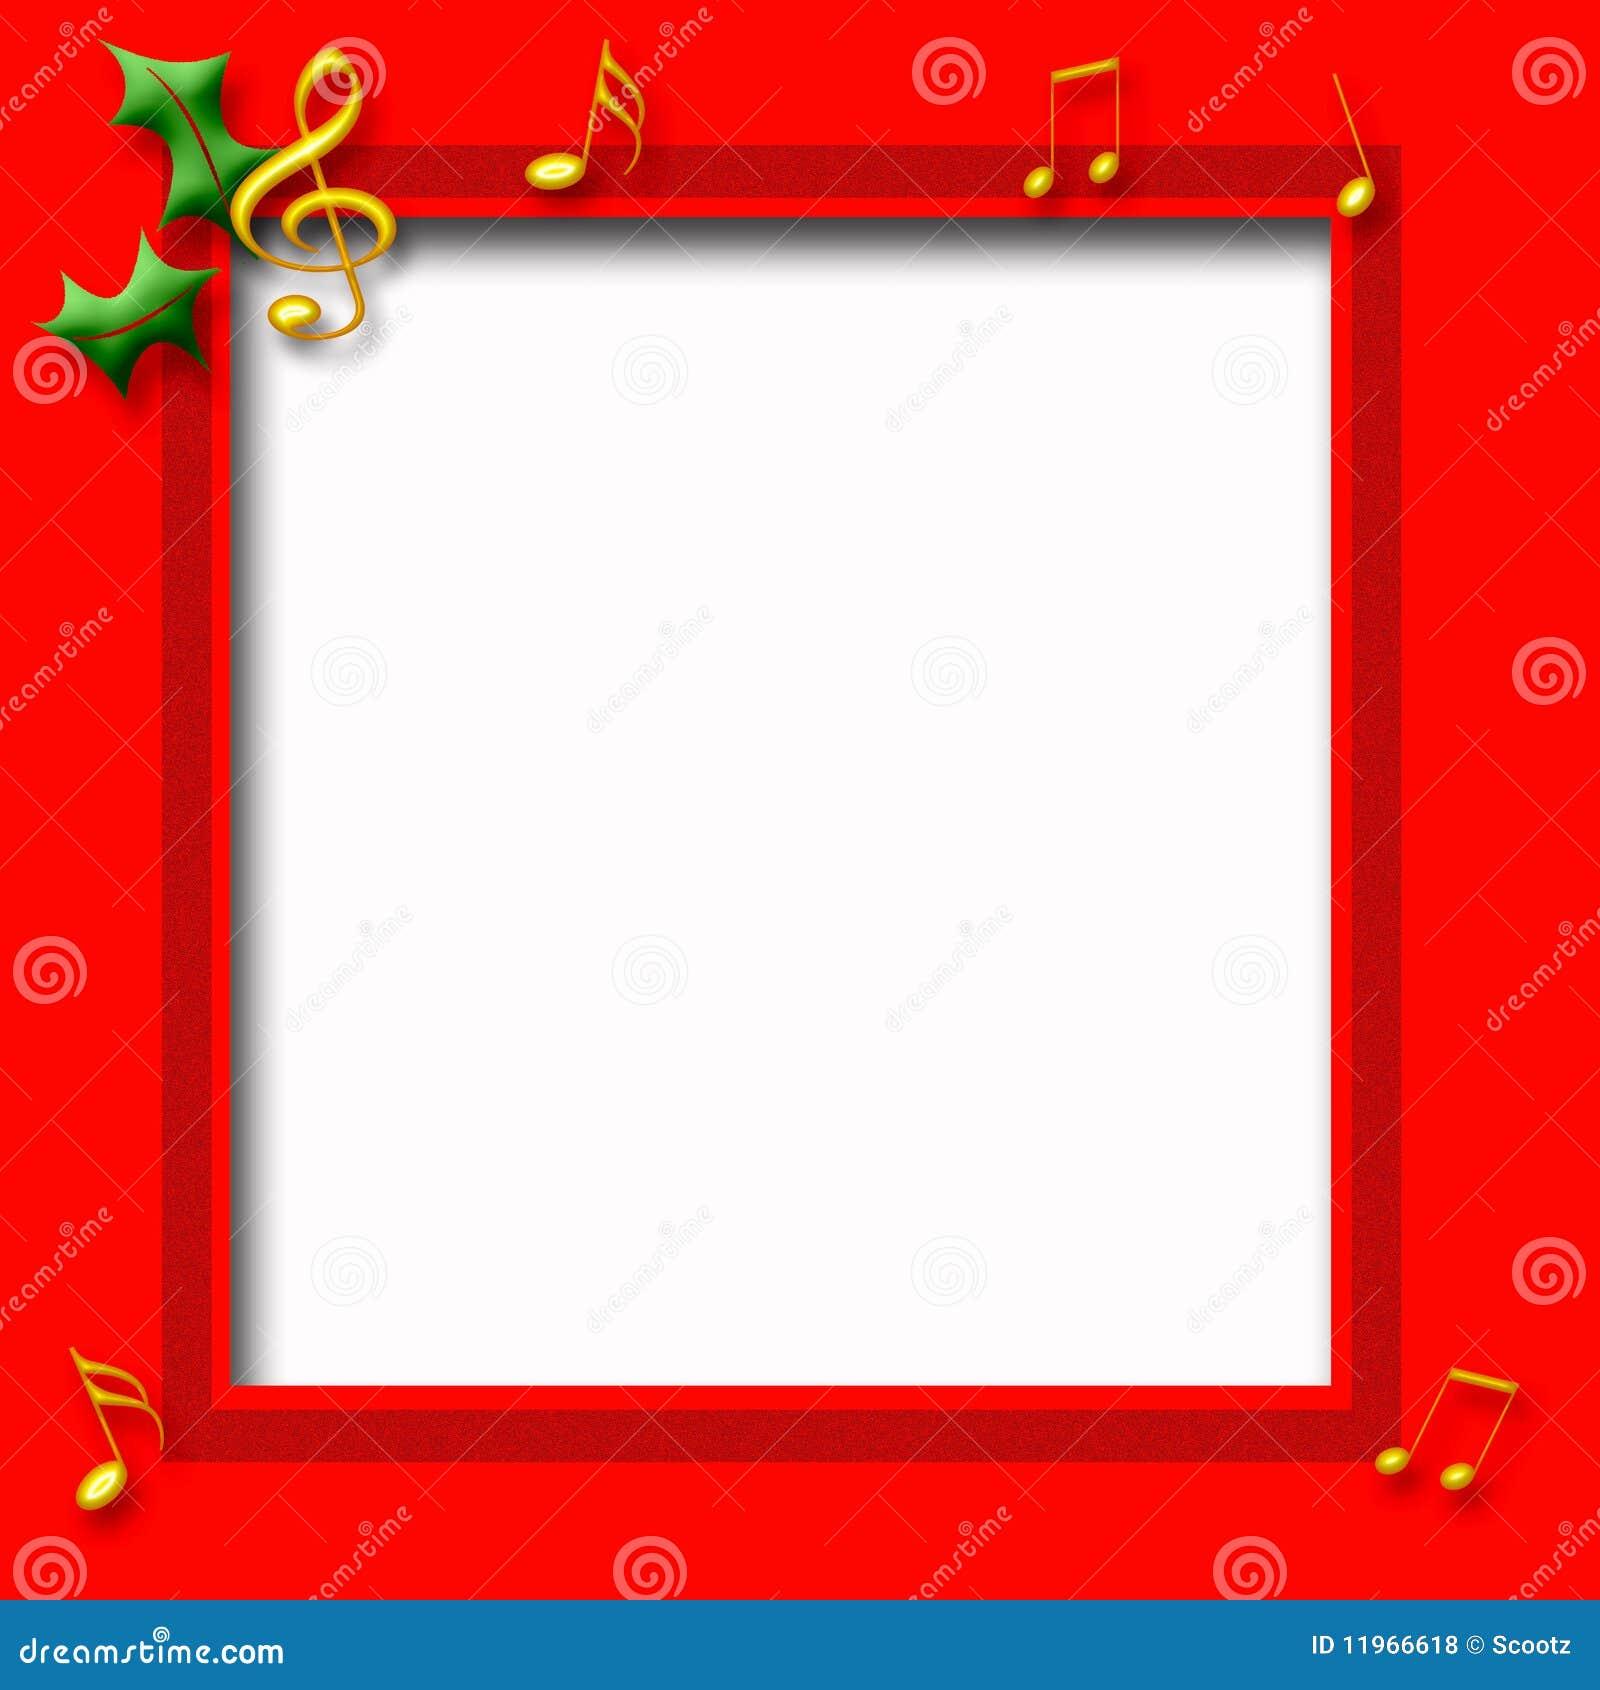 free downloadable christmas music - Roho.4senses.co